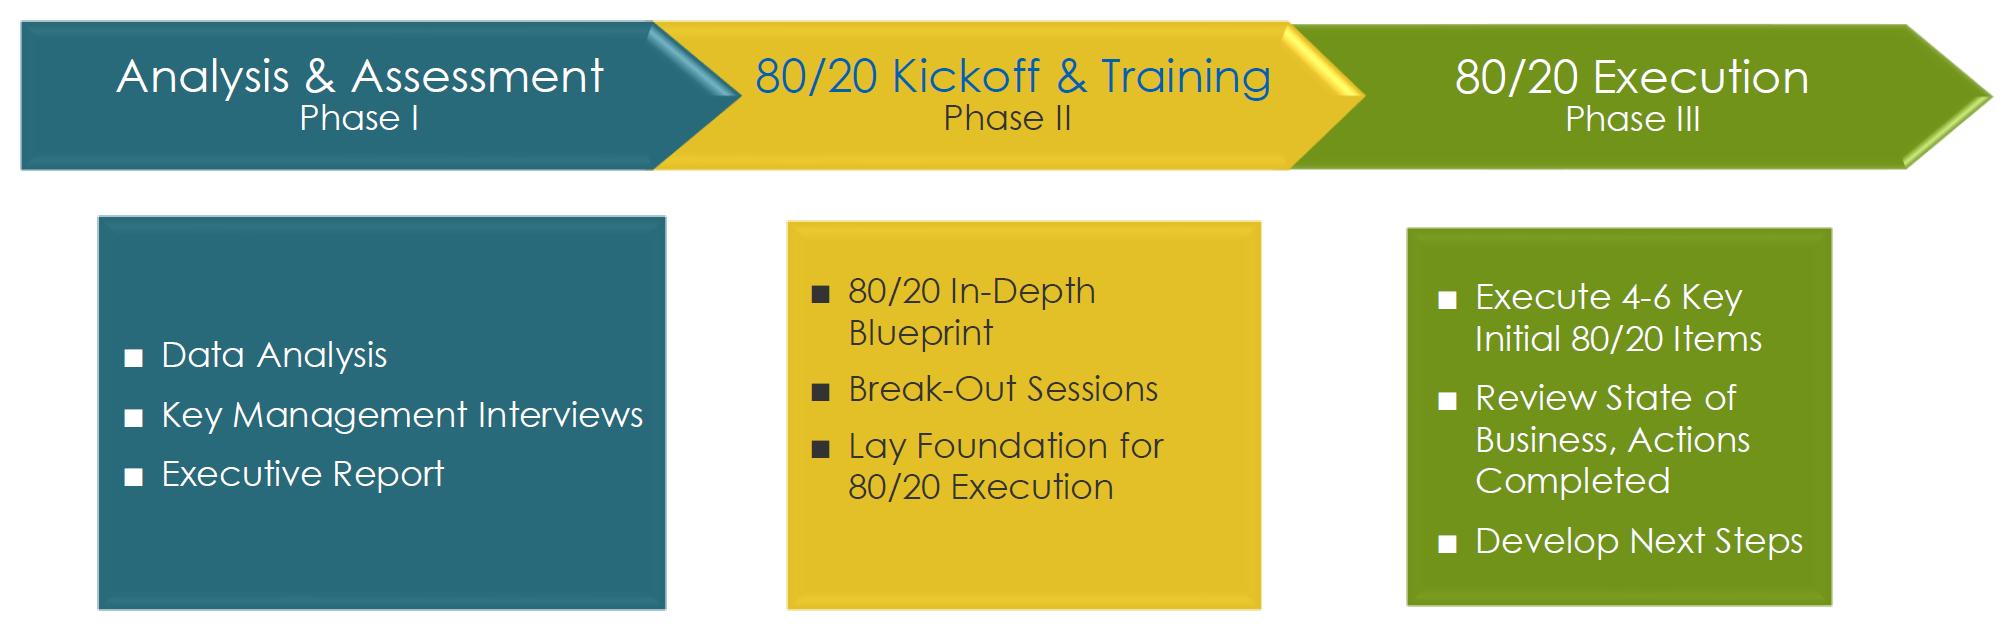 8020 Engagement Process